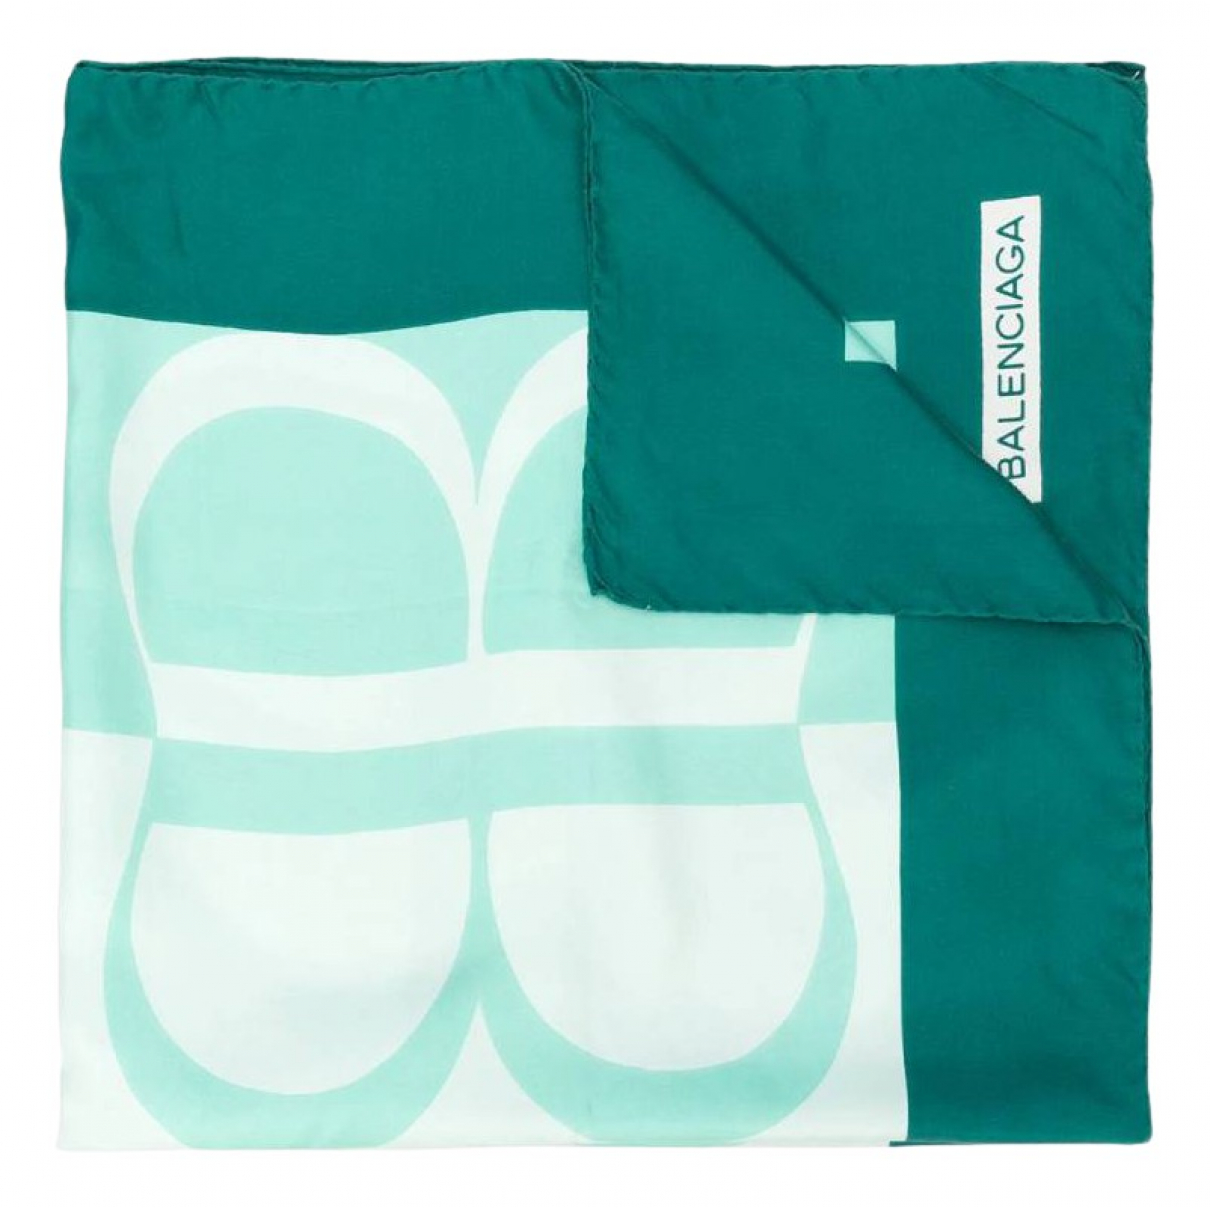 Balenciaga - Foulard   pour femme en soie - turquoise